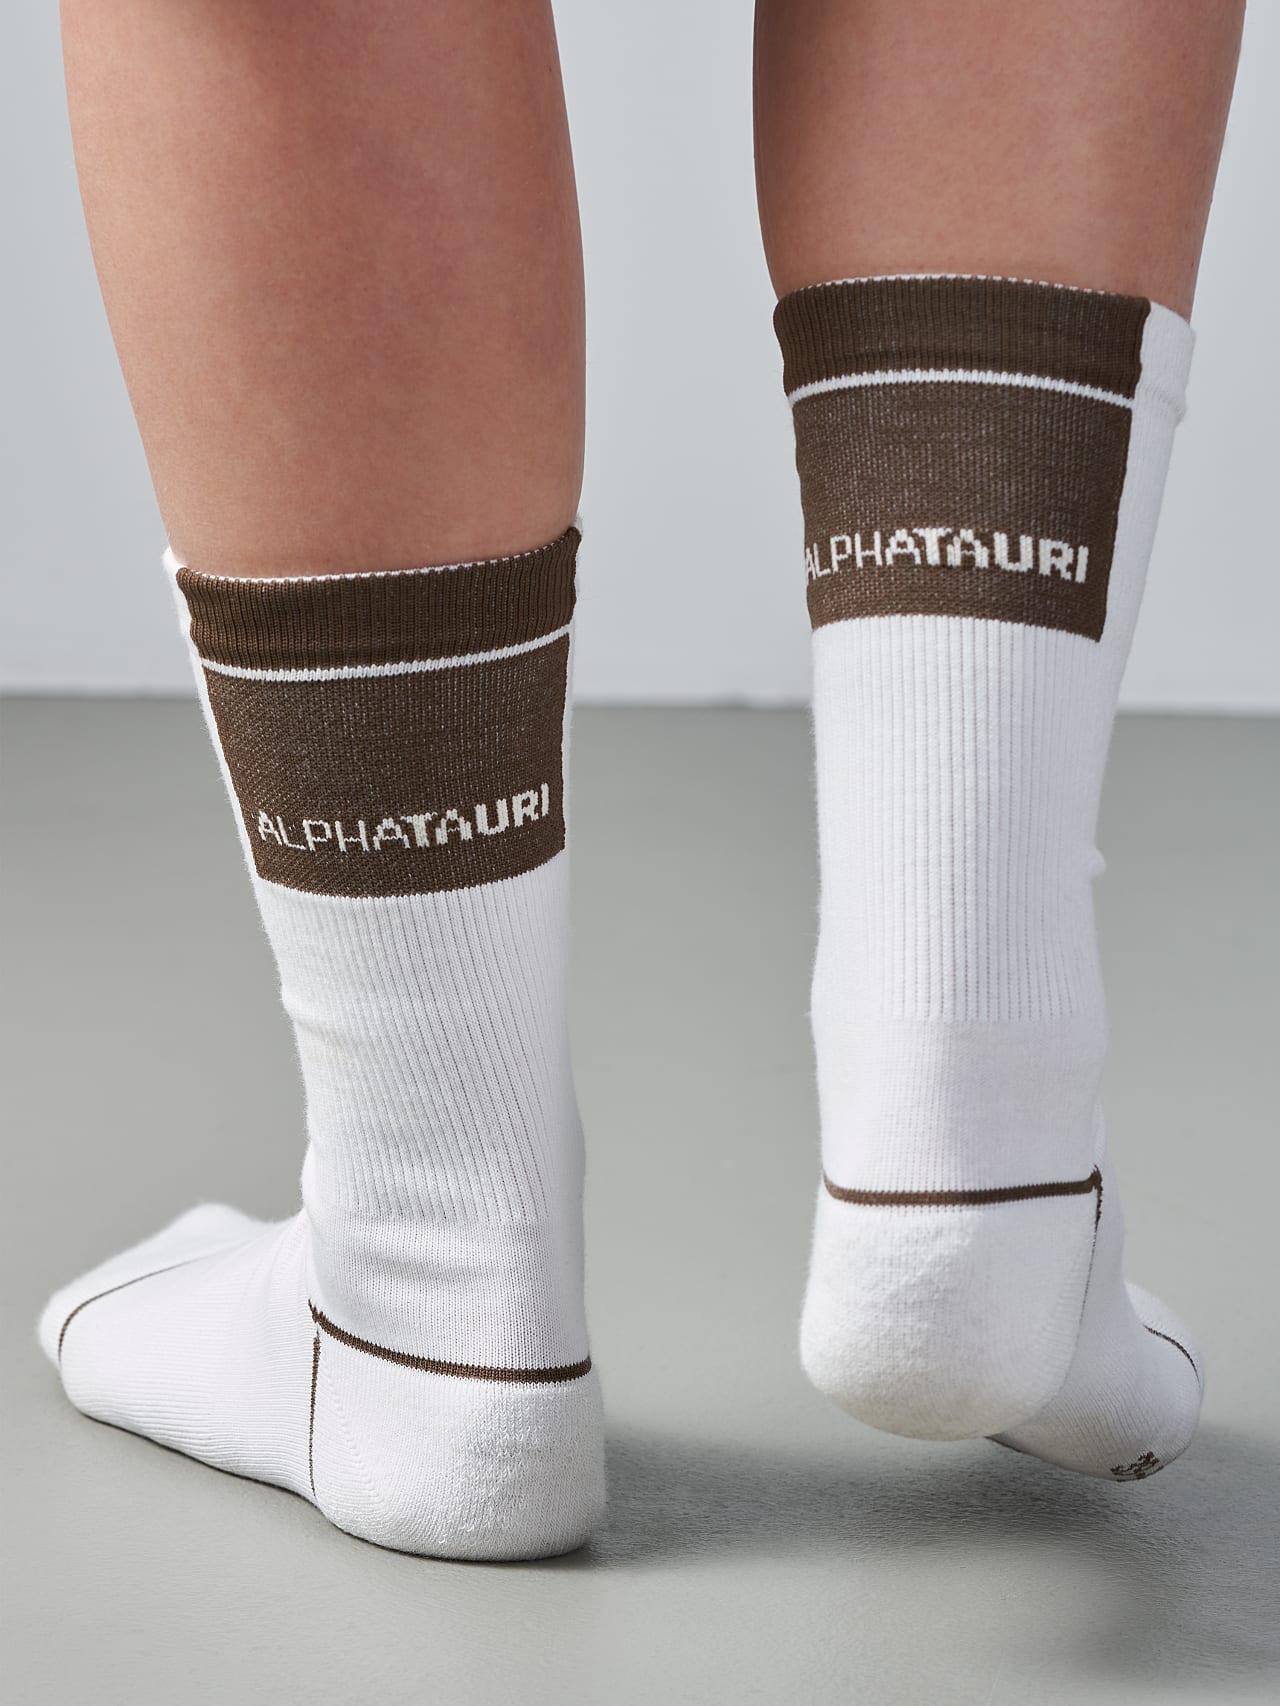 ATENI V3.Y5.02 Premium Knit Socks offwhite Model shot Alpha Tauri